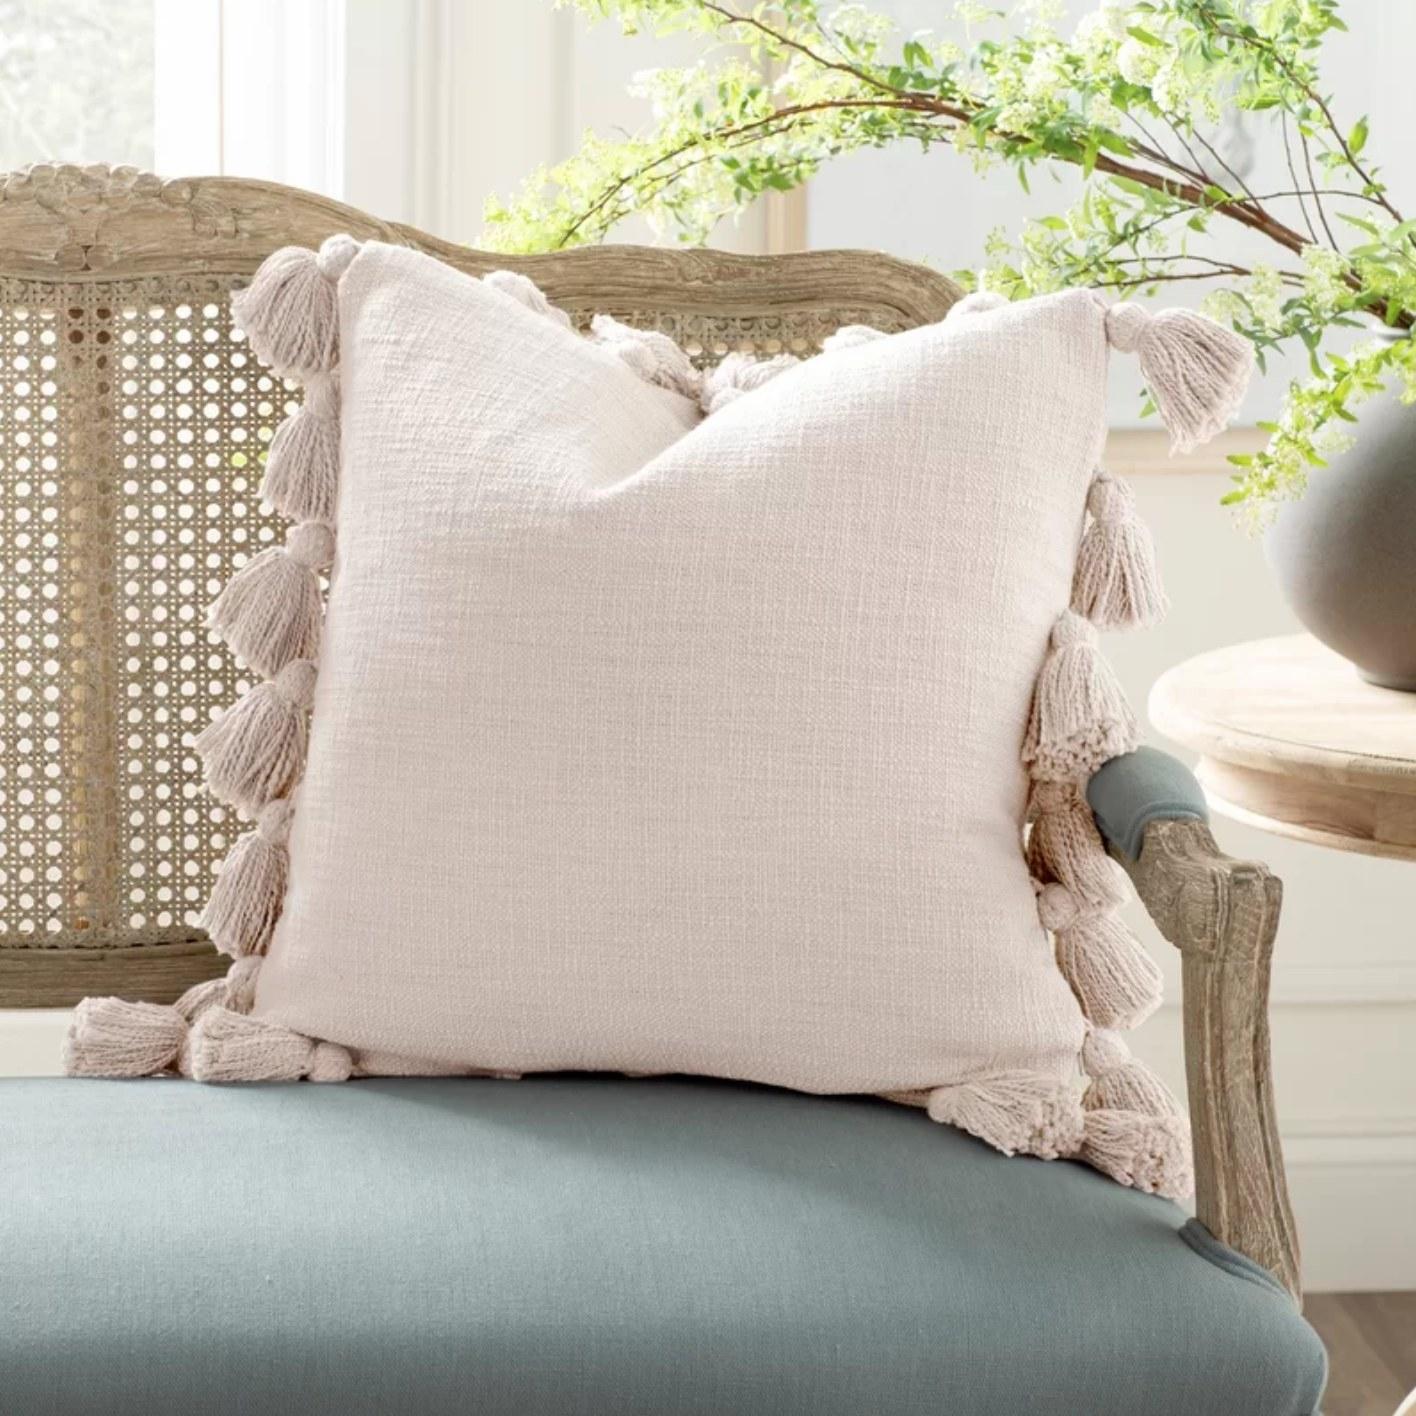 The square pillow in cream